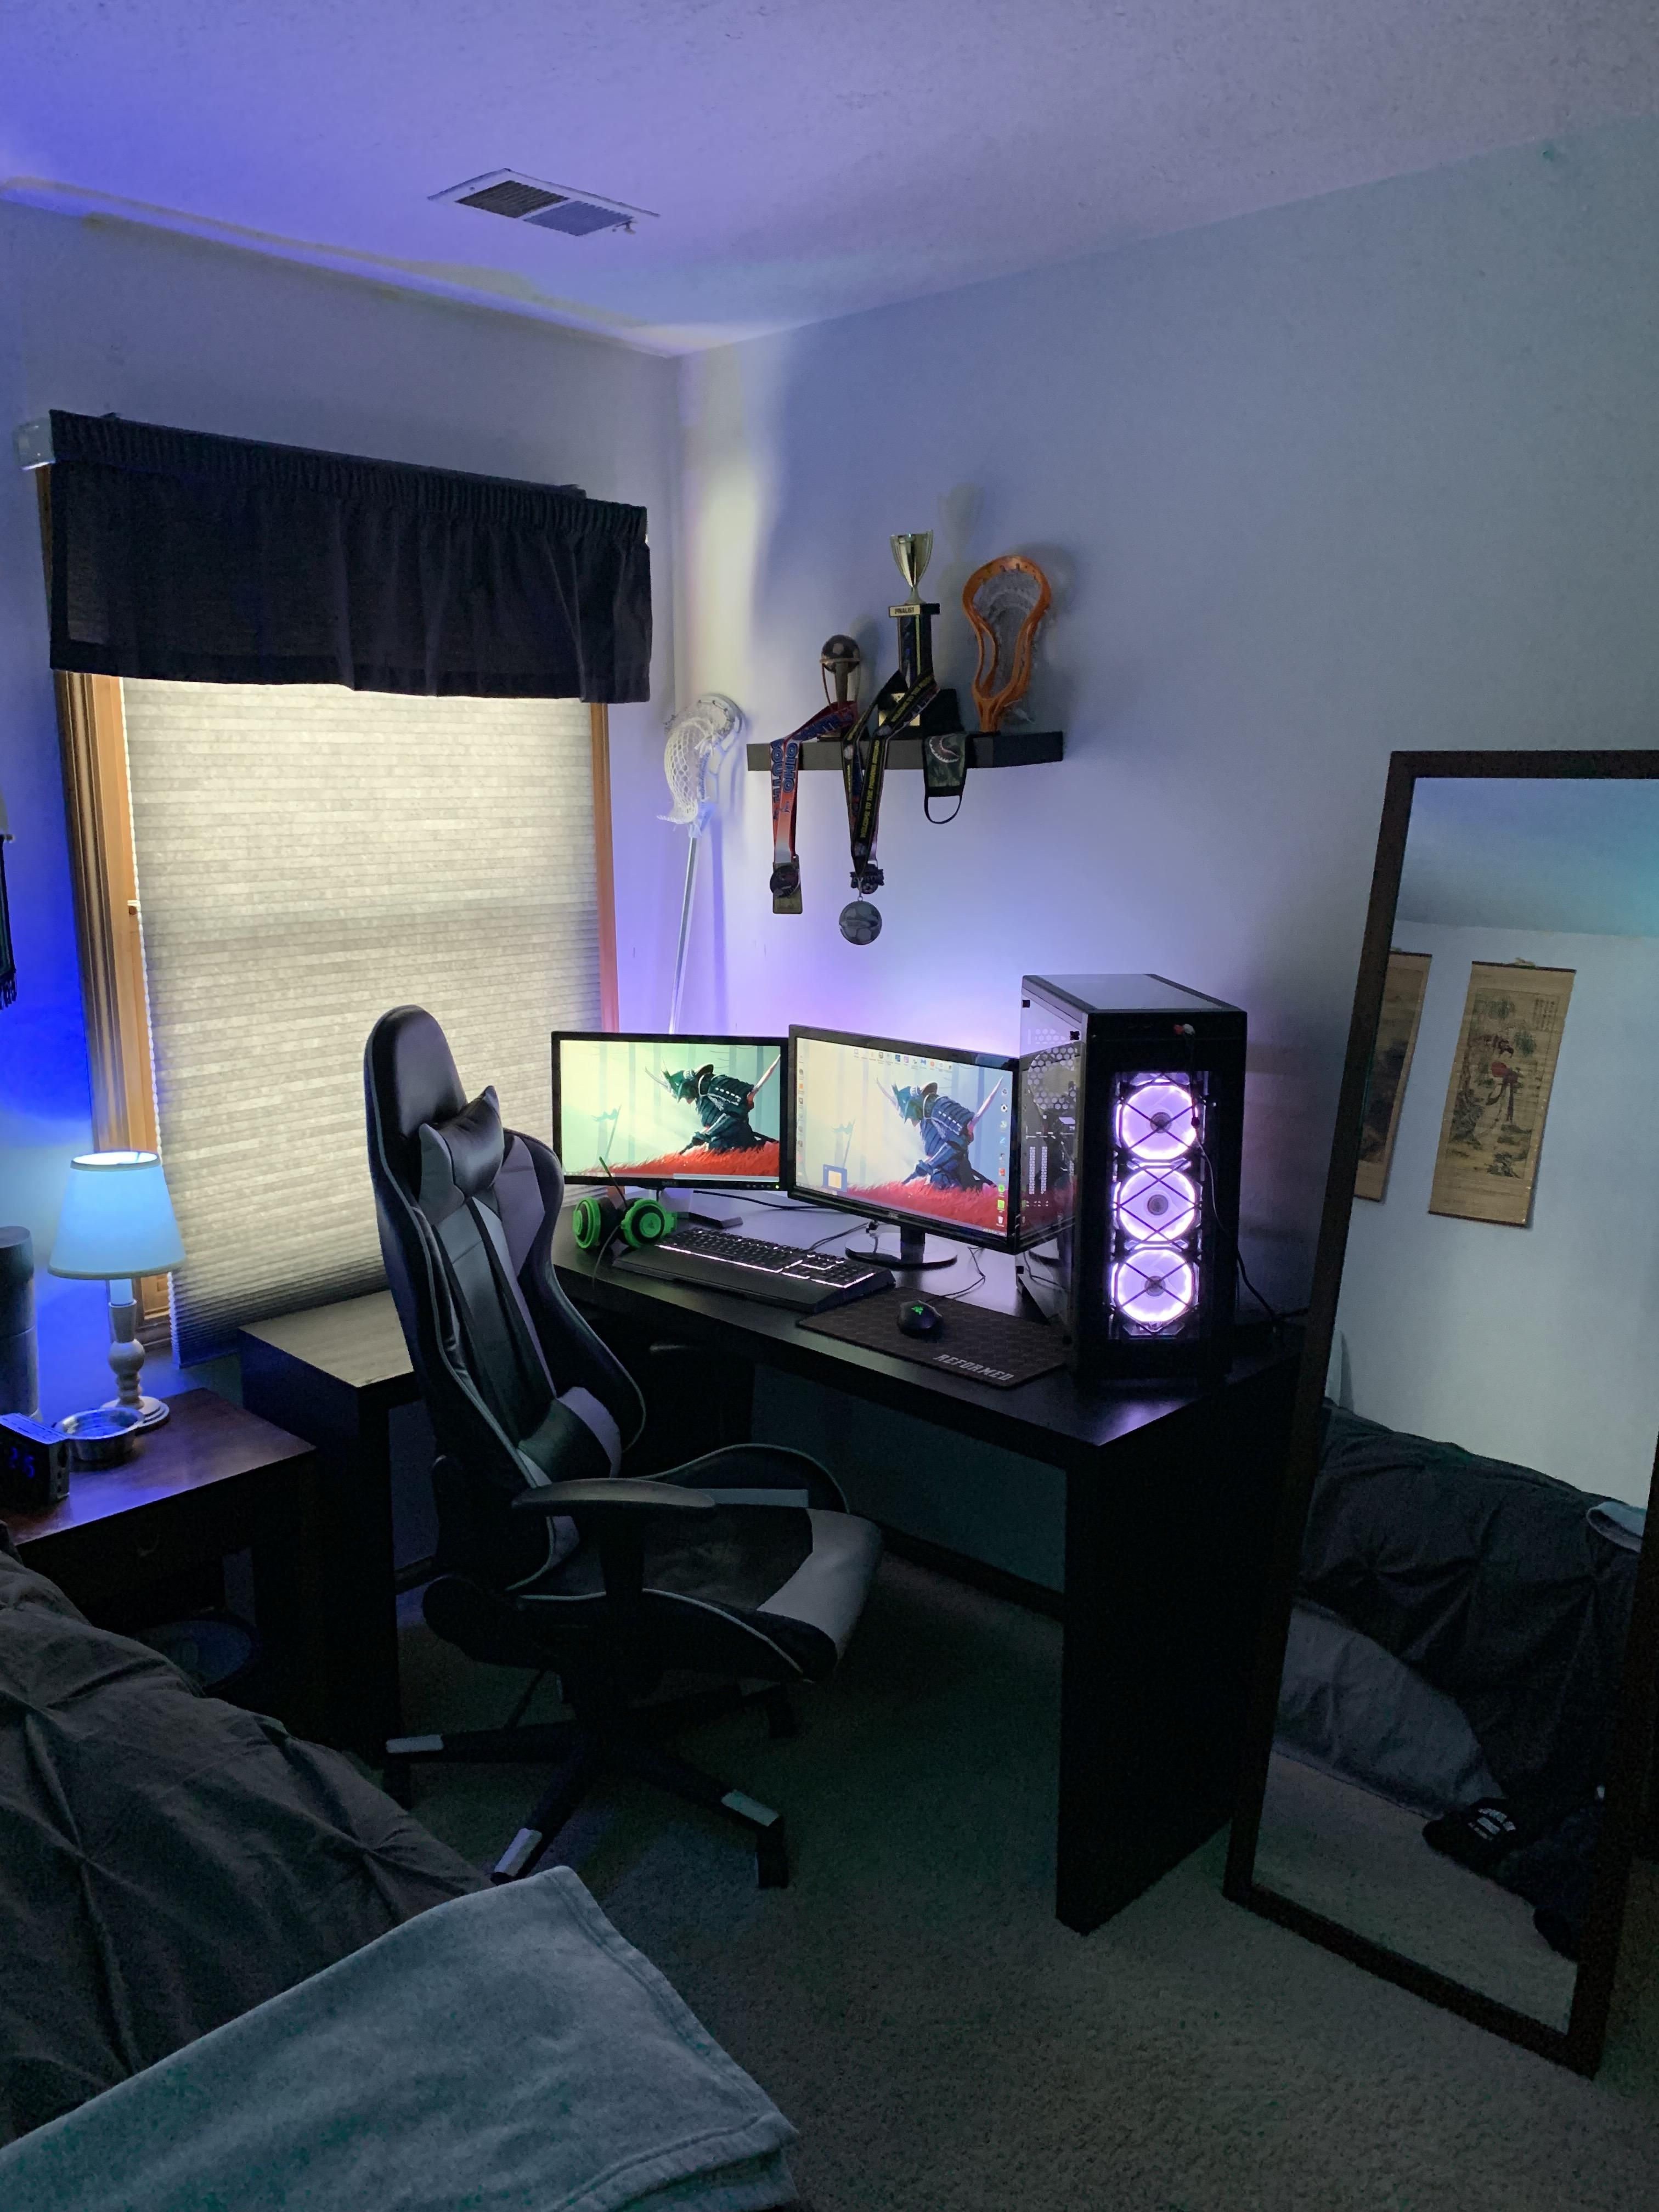 Album of my new setup/bedroom | Gaming room setup, Simple ...